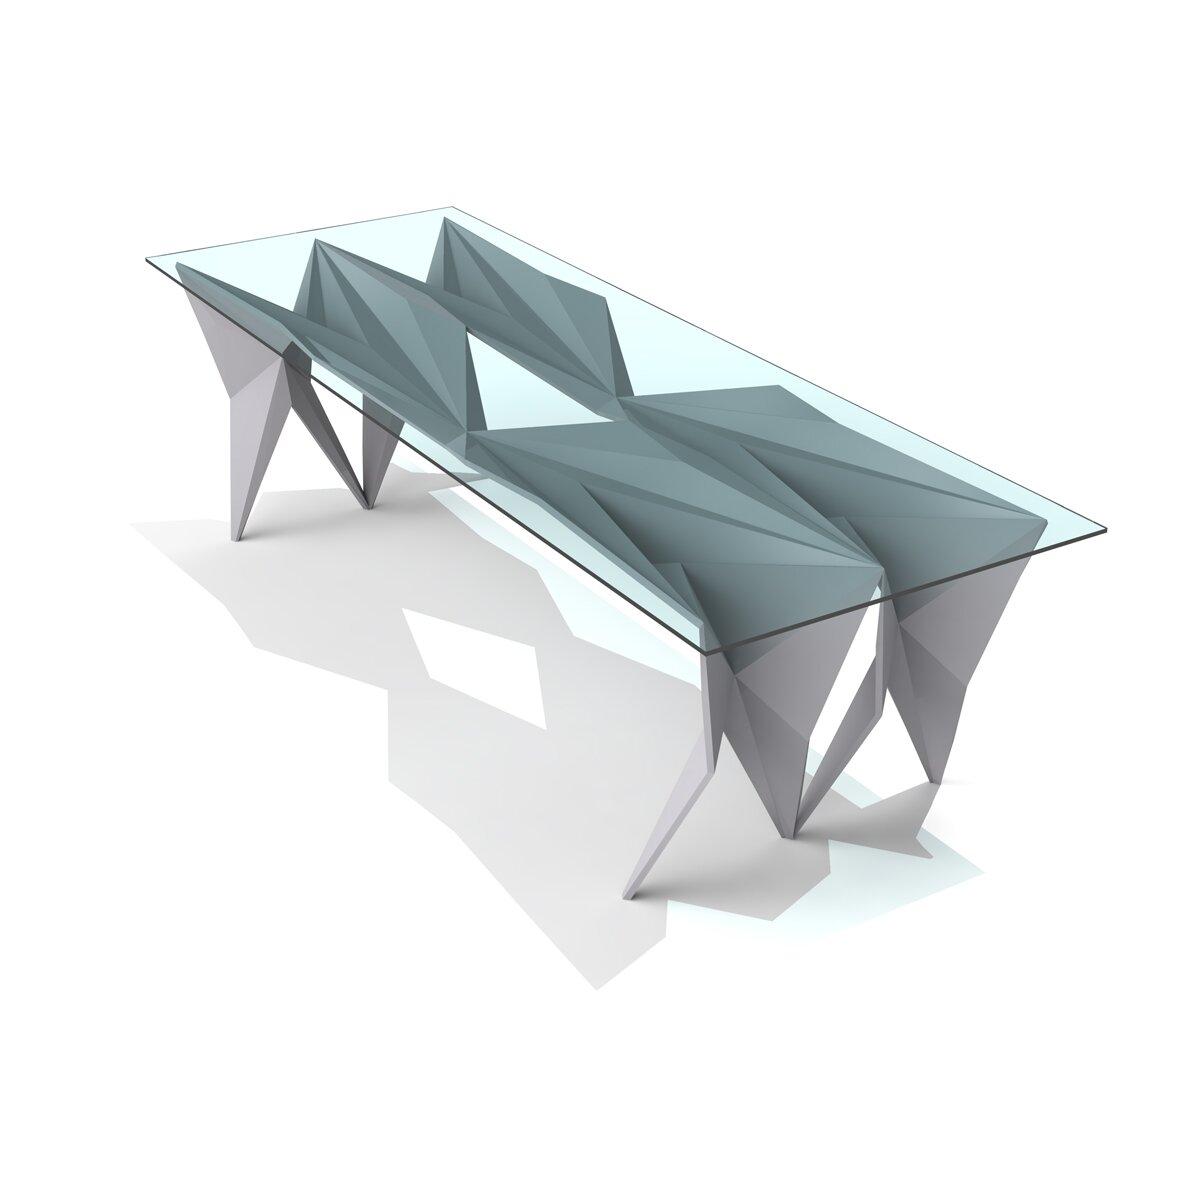 Arktura Stealth Coffee Table & Reviews | Wayfair - Arktura Stealth Coffee Table